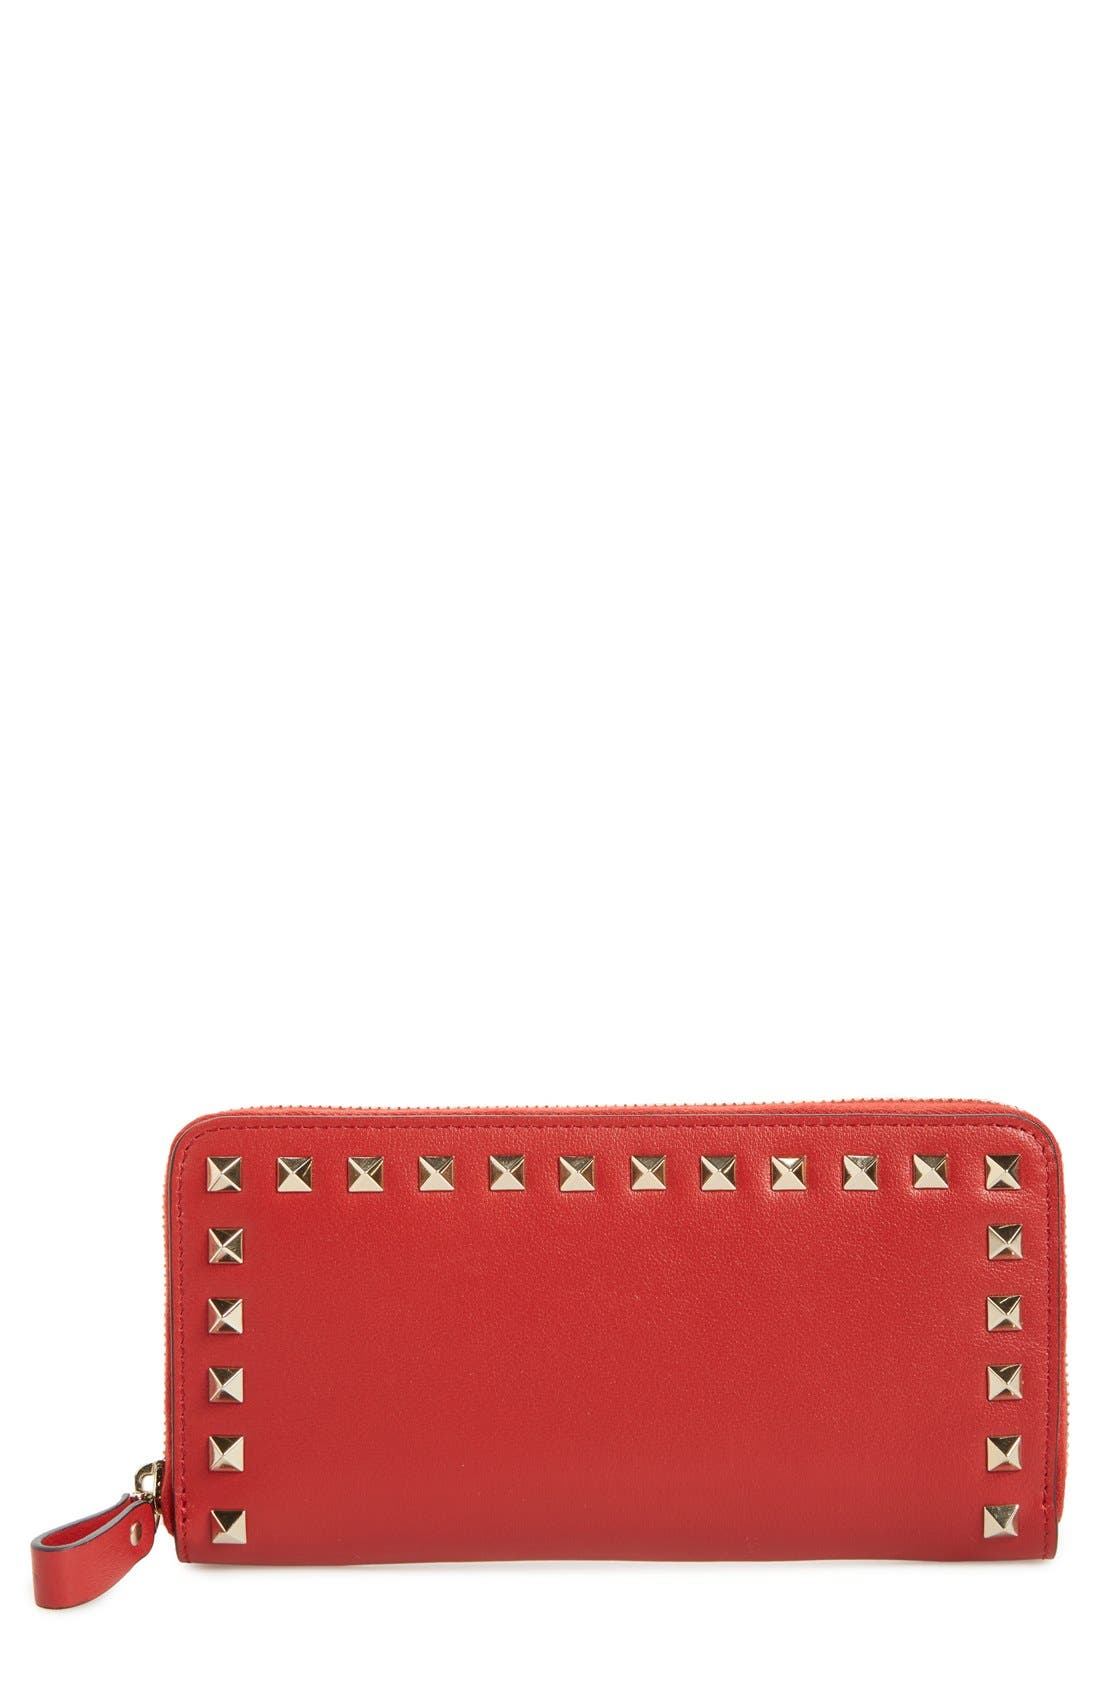 VALENTINO GARAVANI Rockstud Continental Leather Wallet